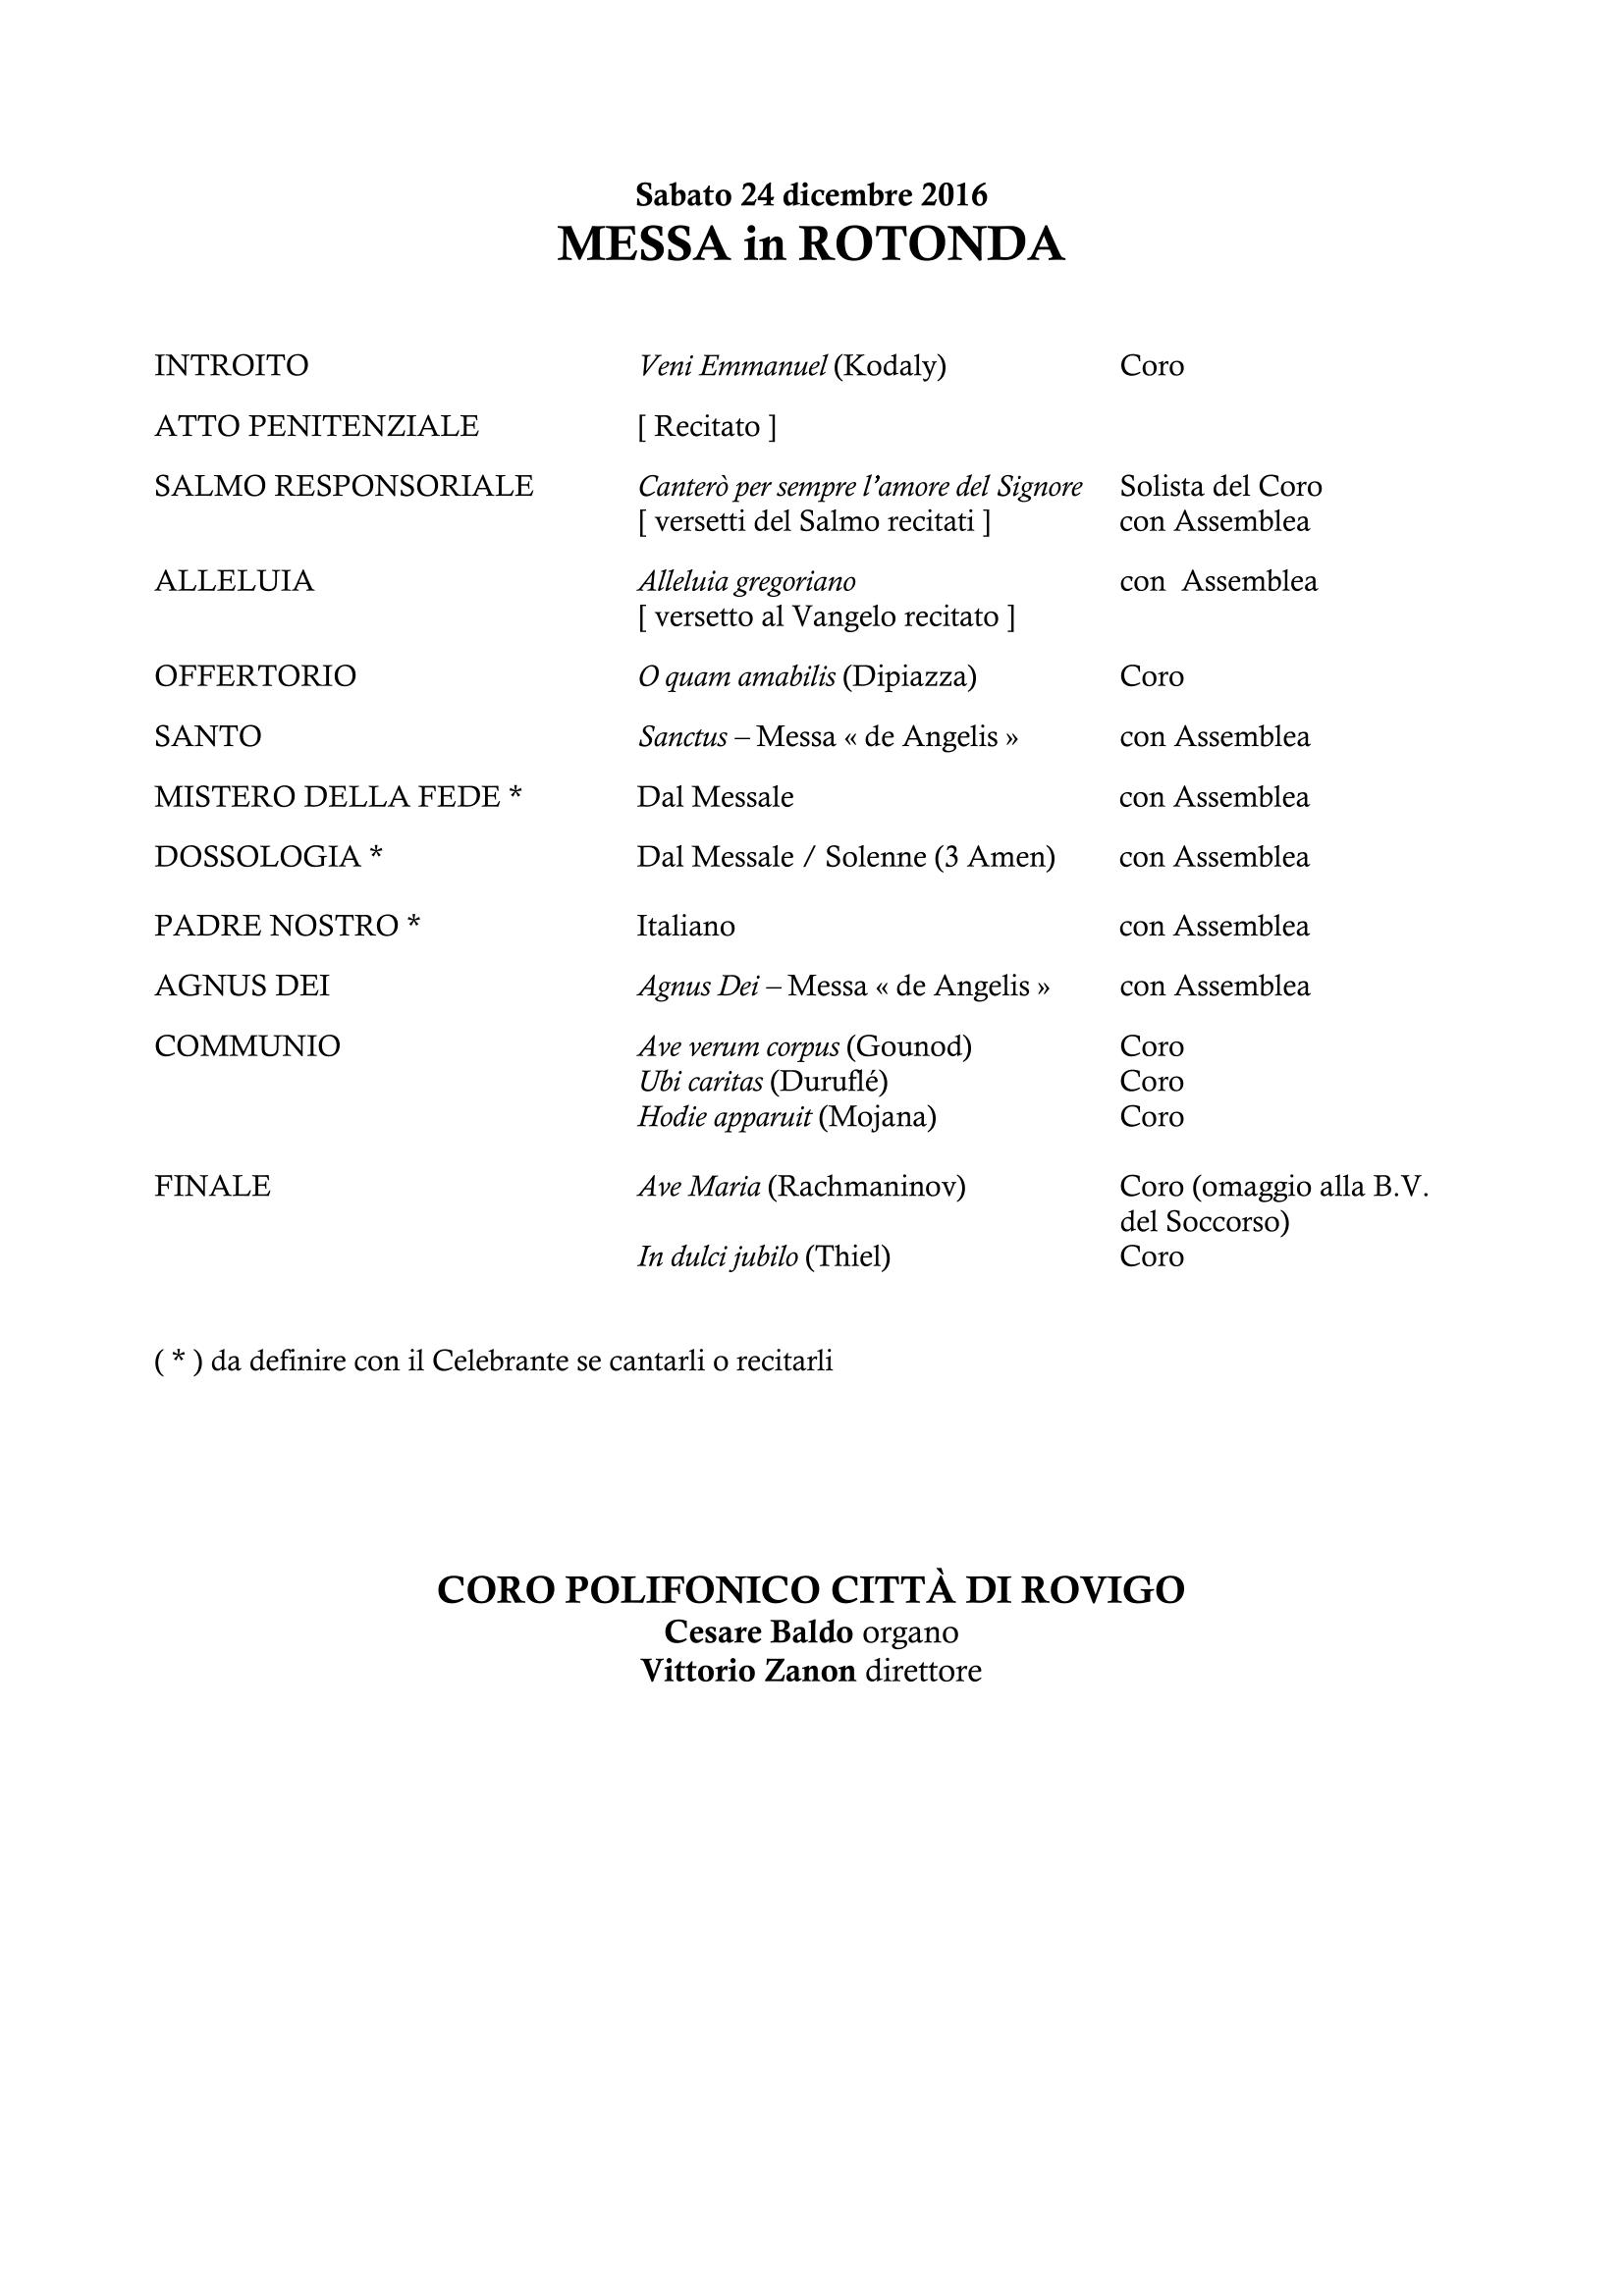 programma-messa-rotonda_24-12-2016-1